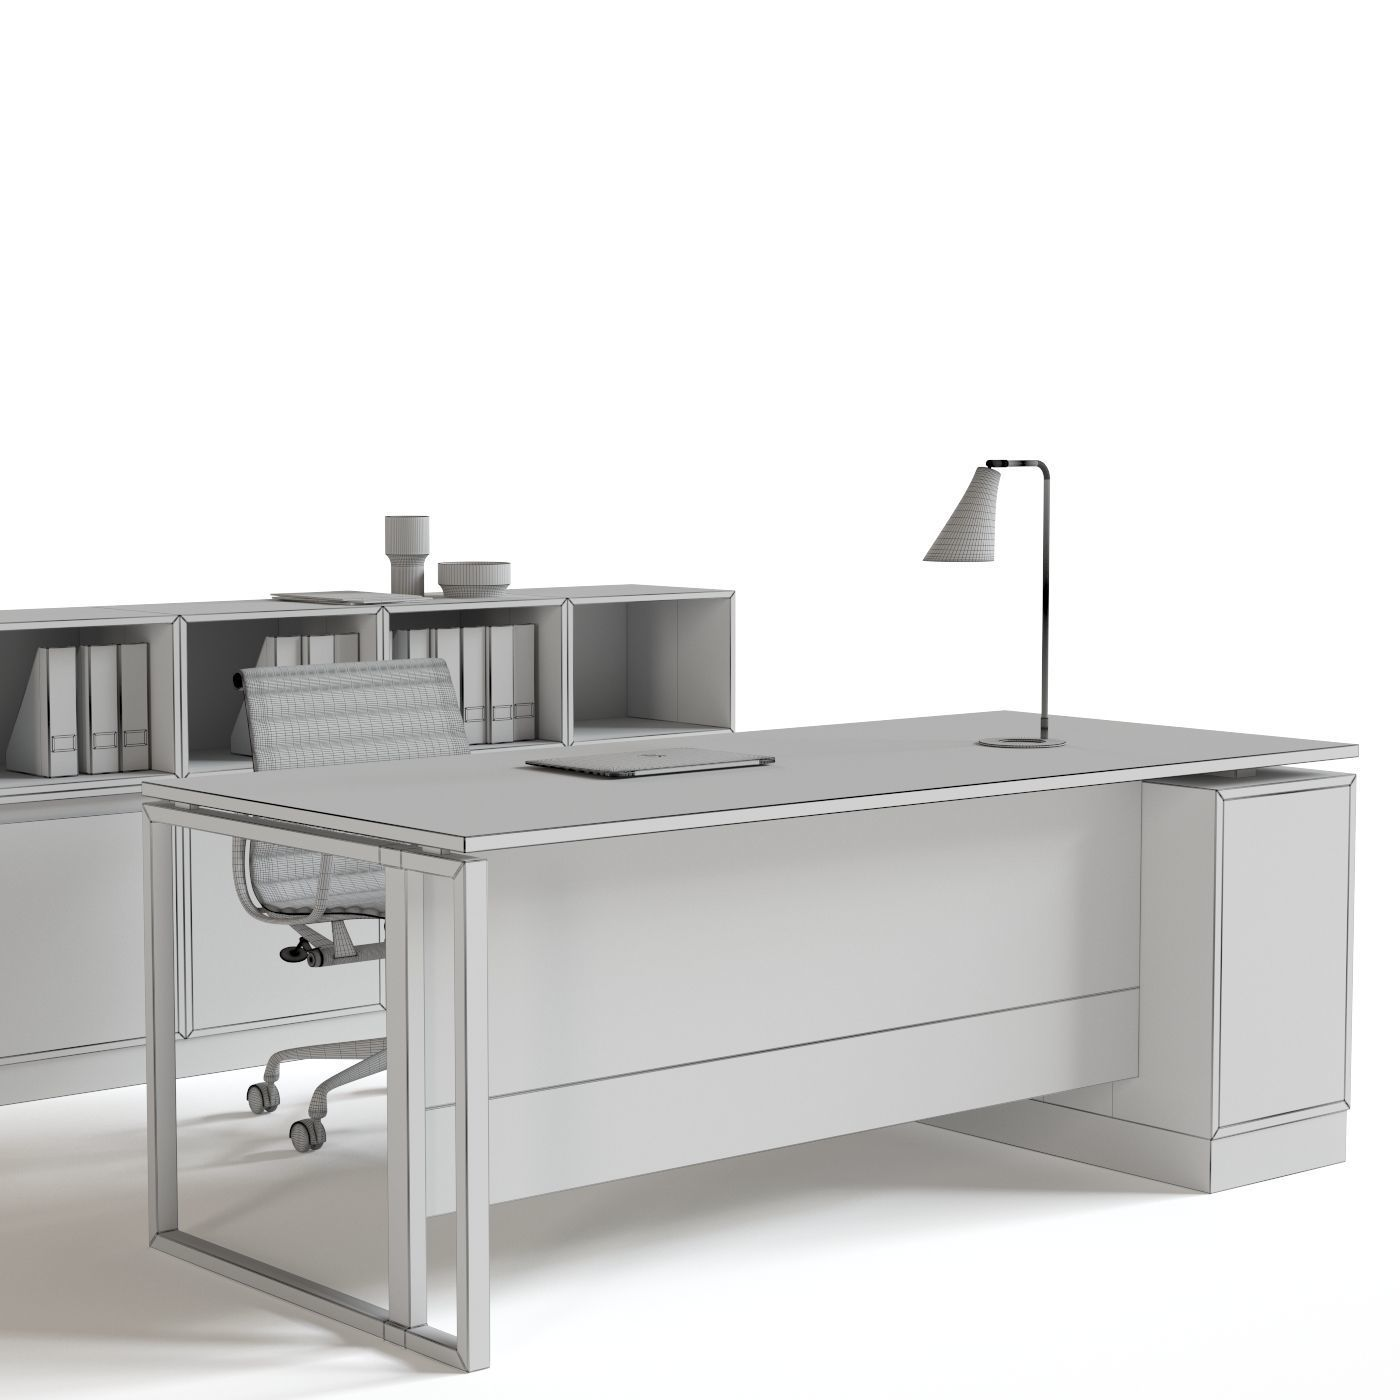 Office Reception Furniture Set Model Max Obj Mtl Fbx 9